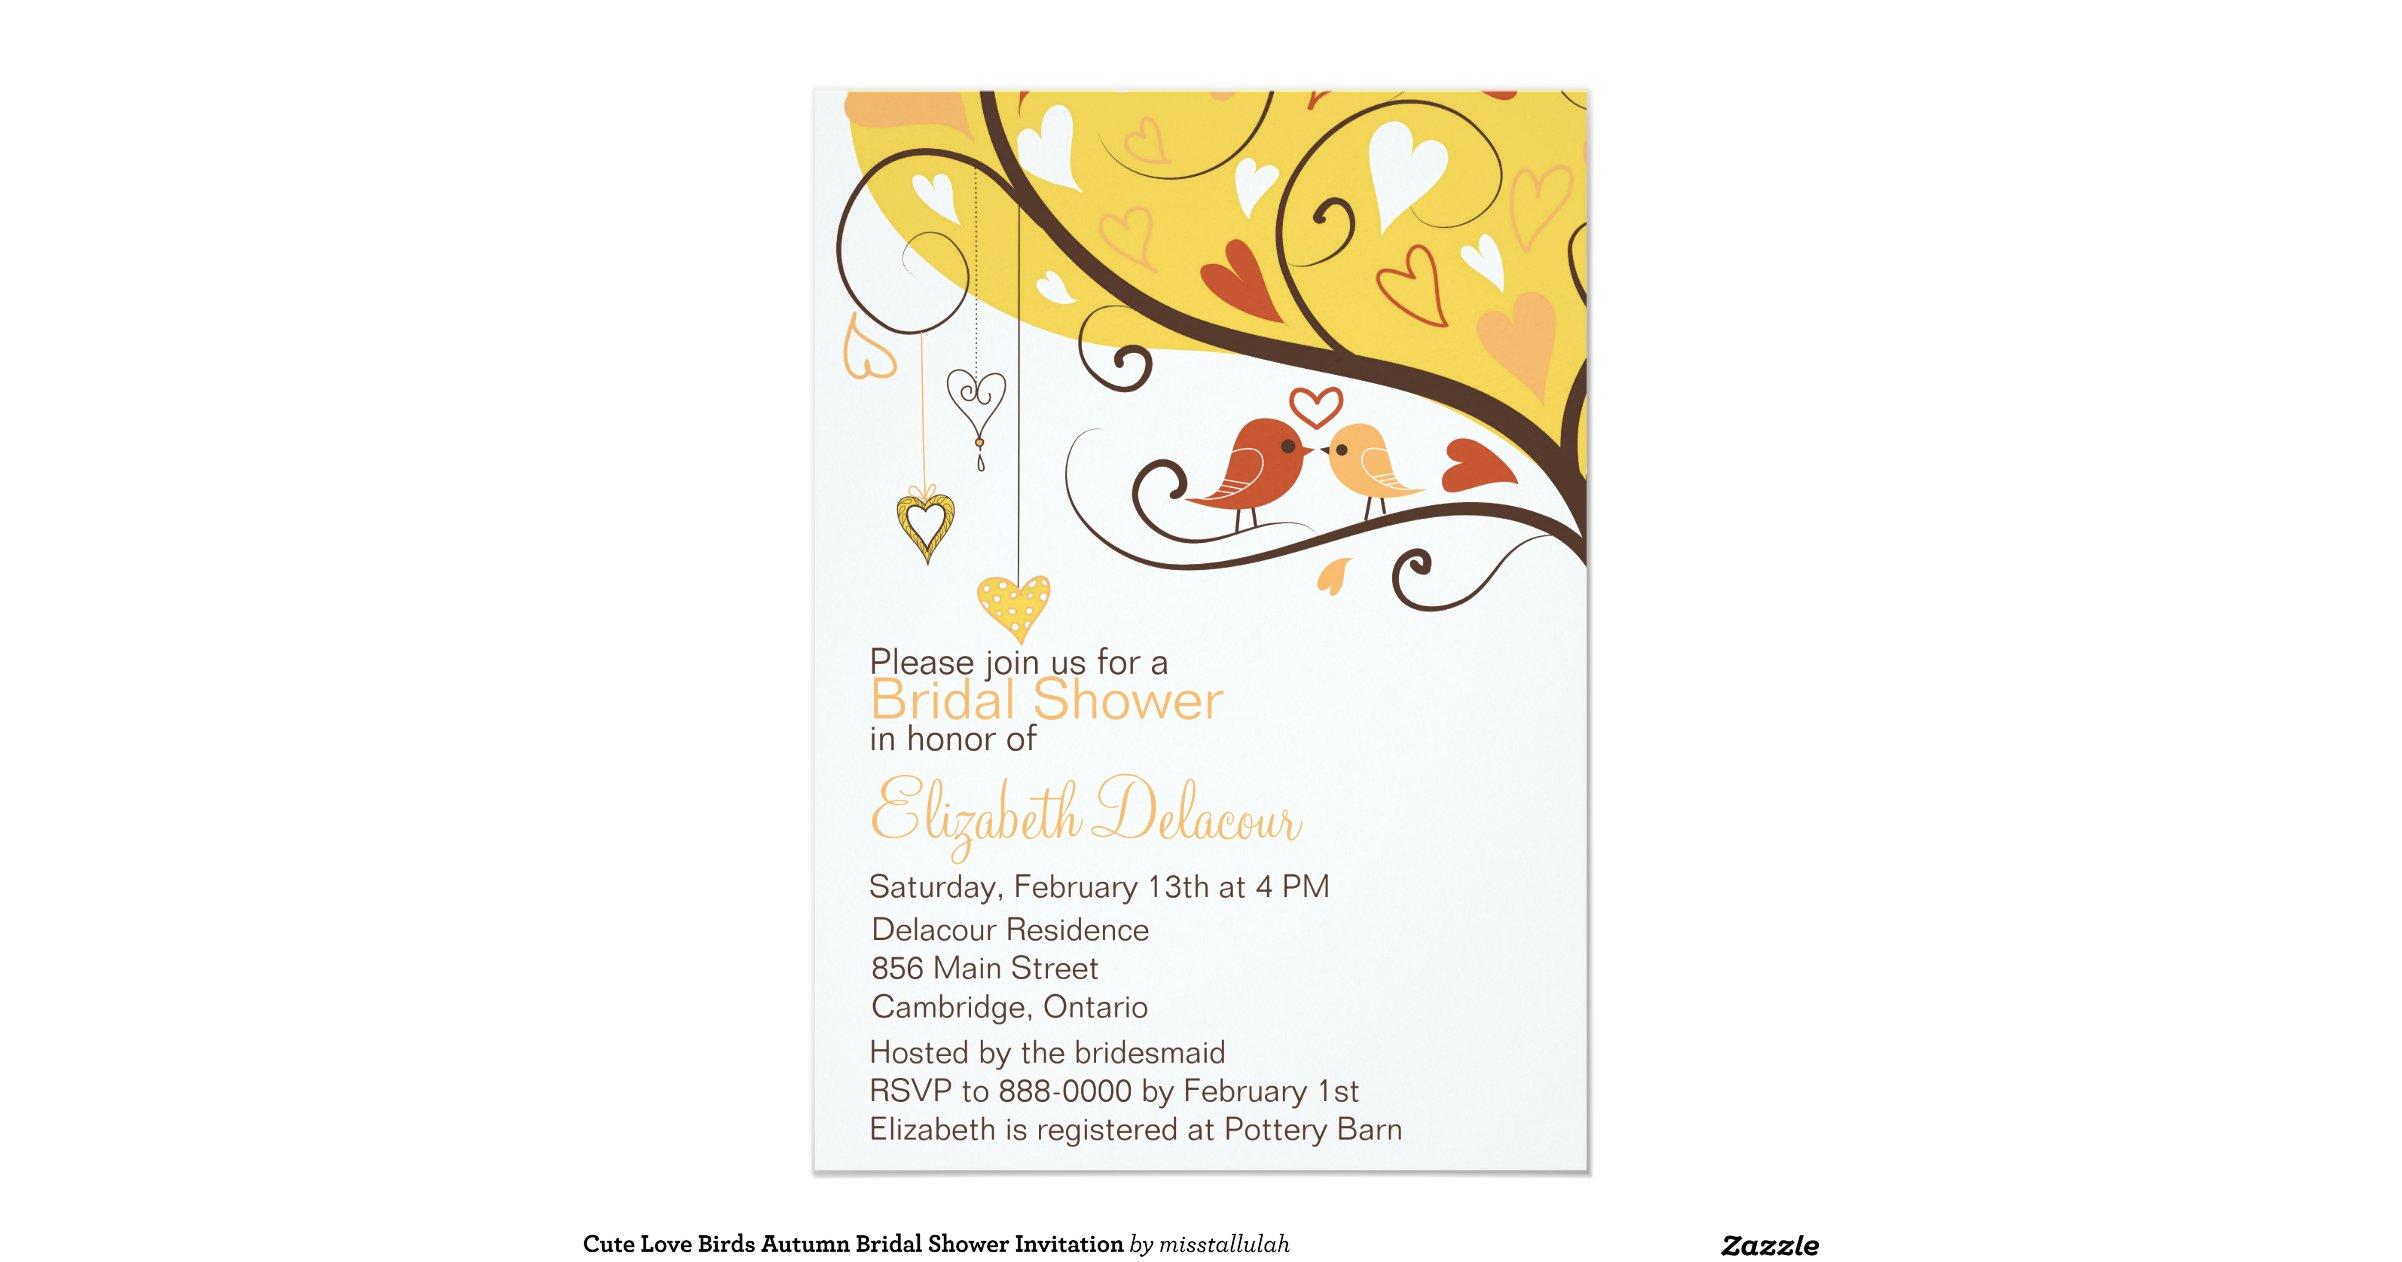 White Love Birds On Red Cards Invitations Zazzle Com Au